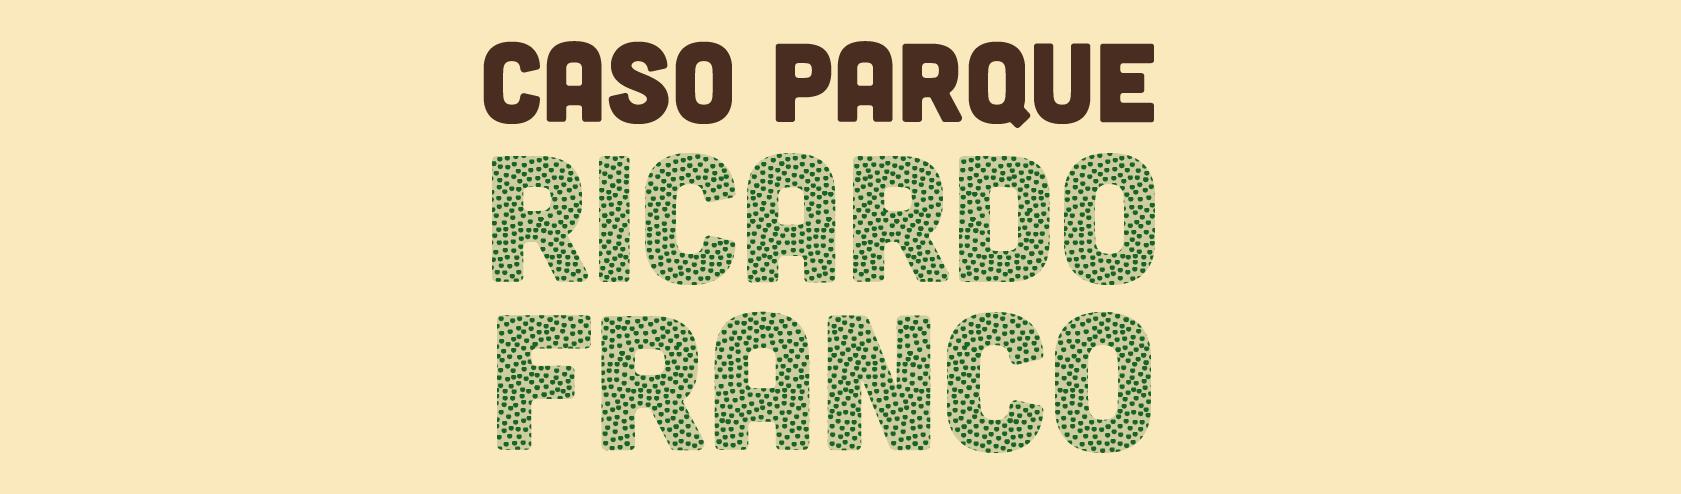 Caso Parque Ricardo Franco